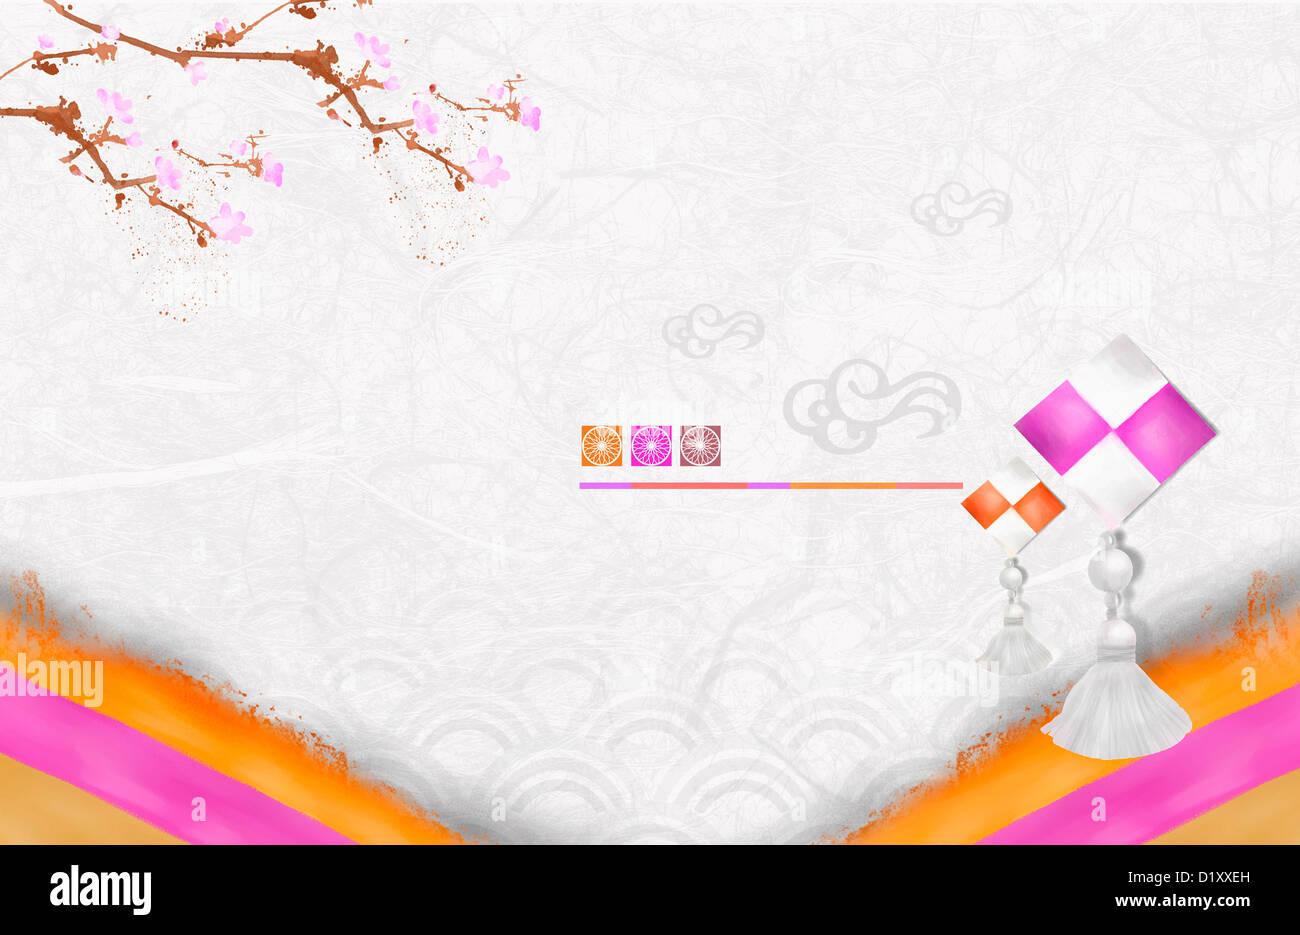 ppt template illustration of korean traditional design stock photo  52837305